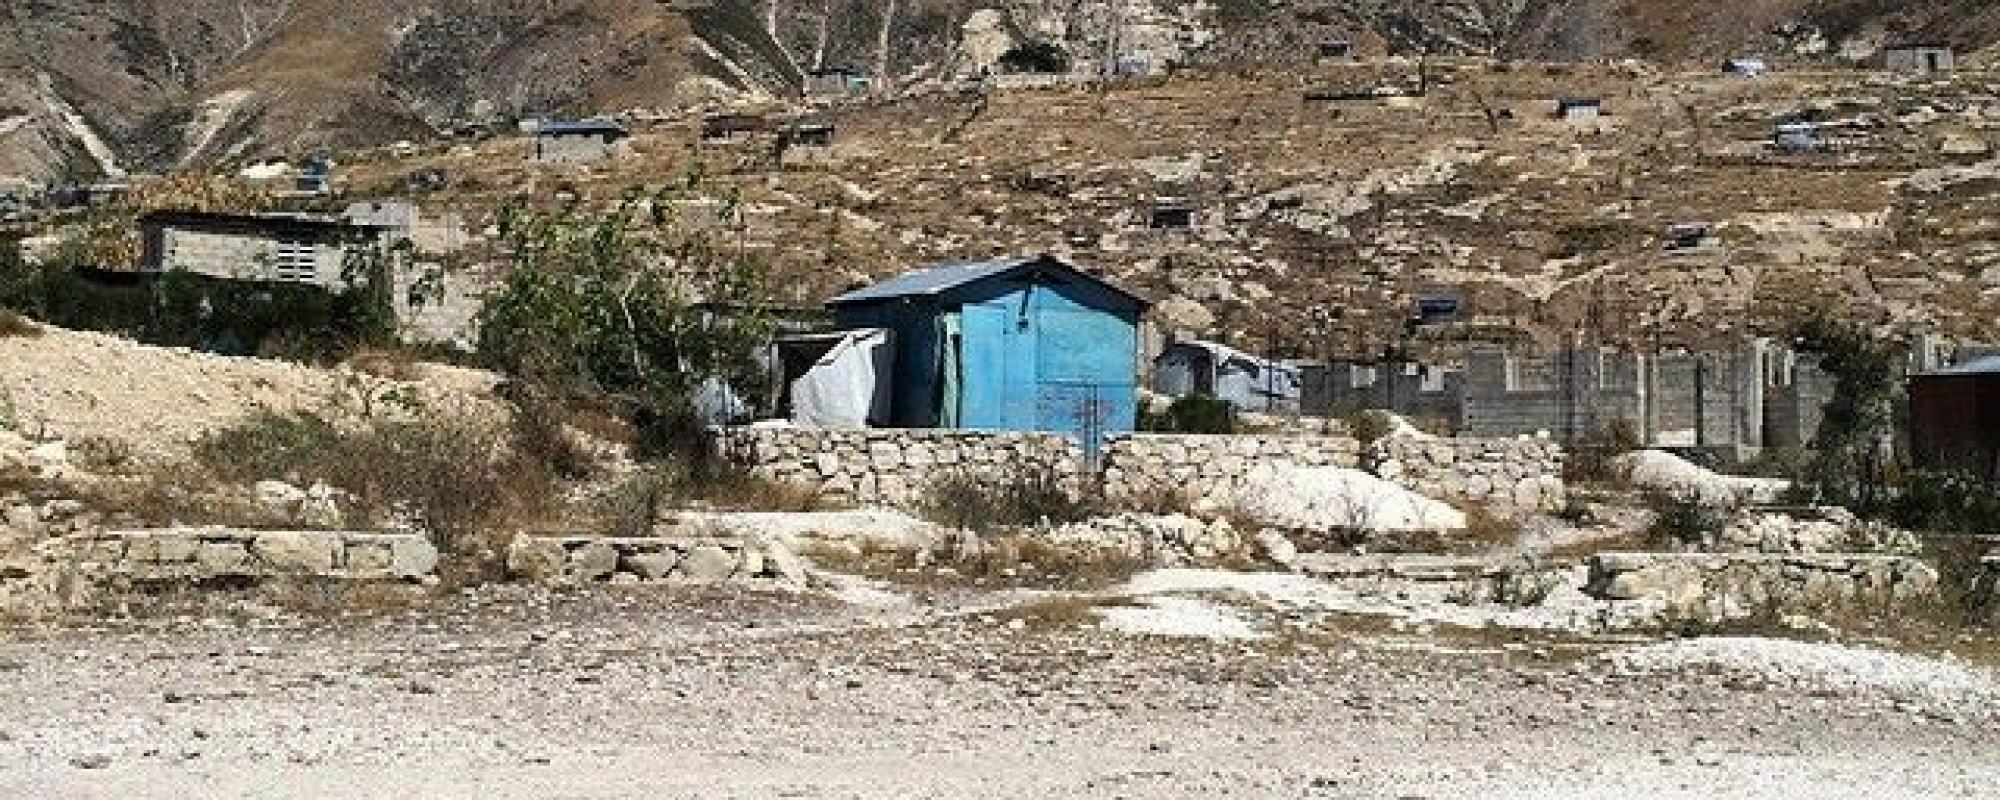 Haiti in terrible condition